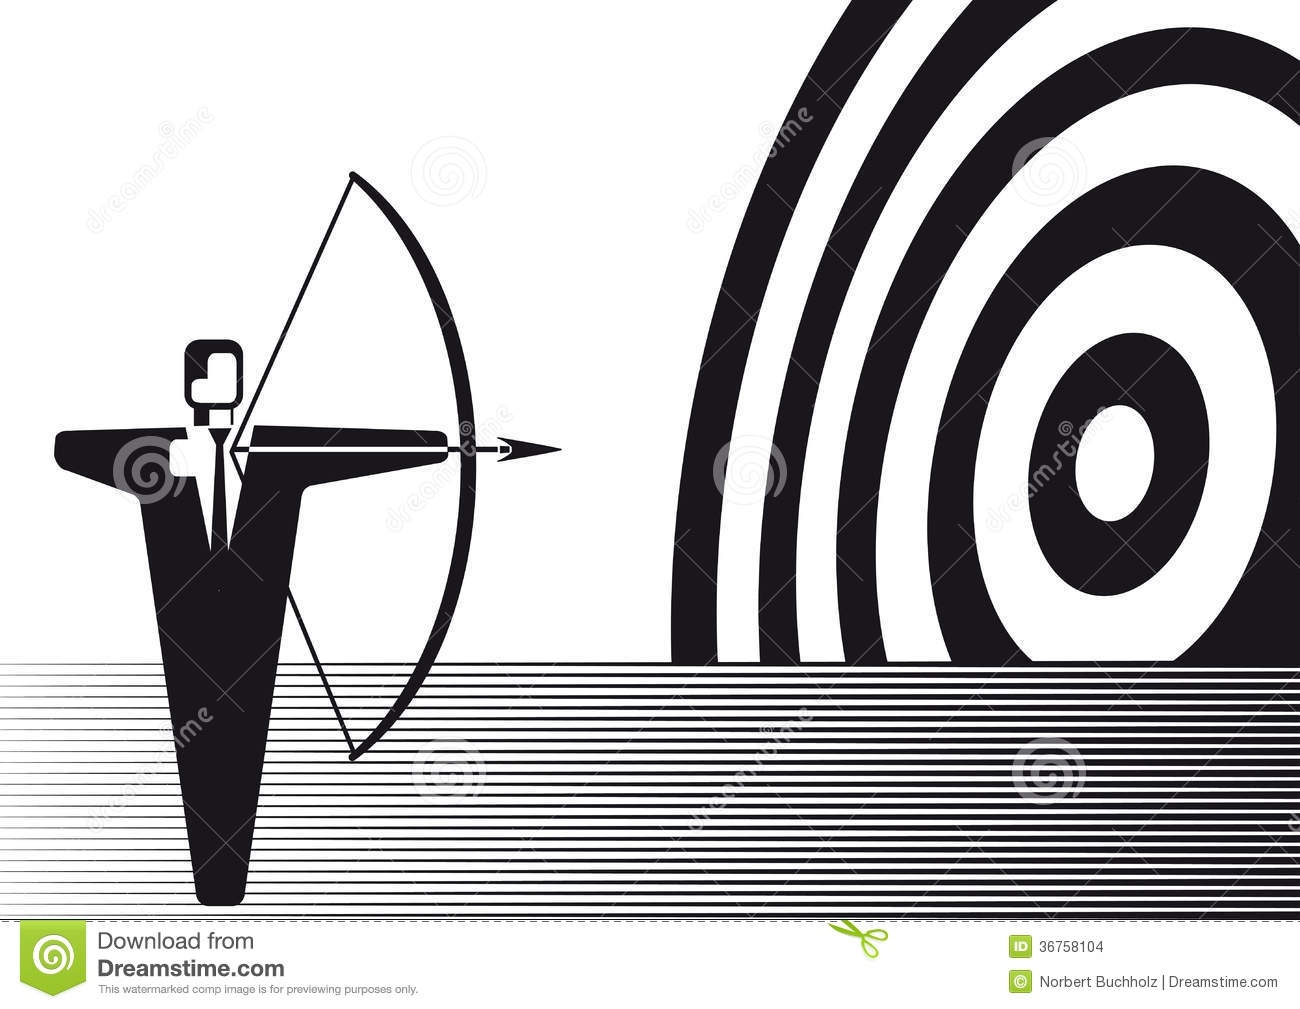 Shooting arrow target clipart clipart download Bow And Arrow Target Clipart - clipartsgram.com clipart download